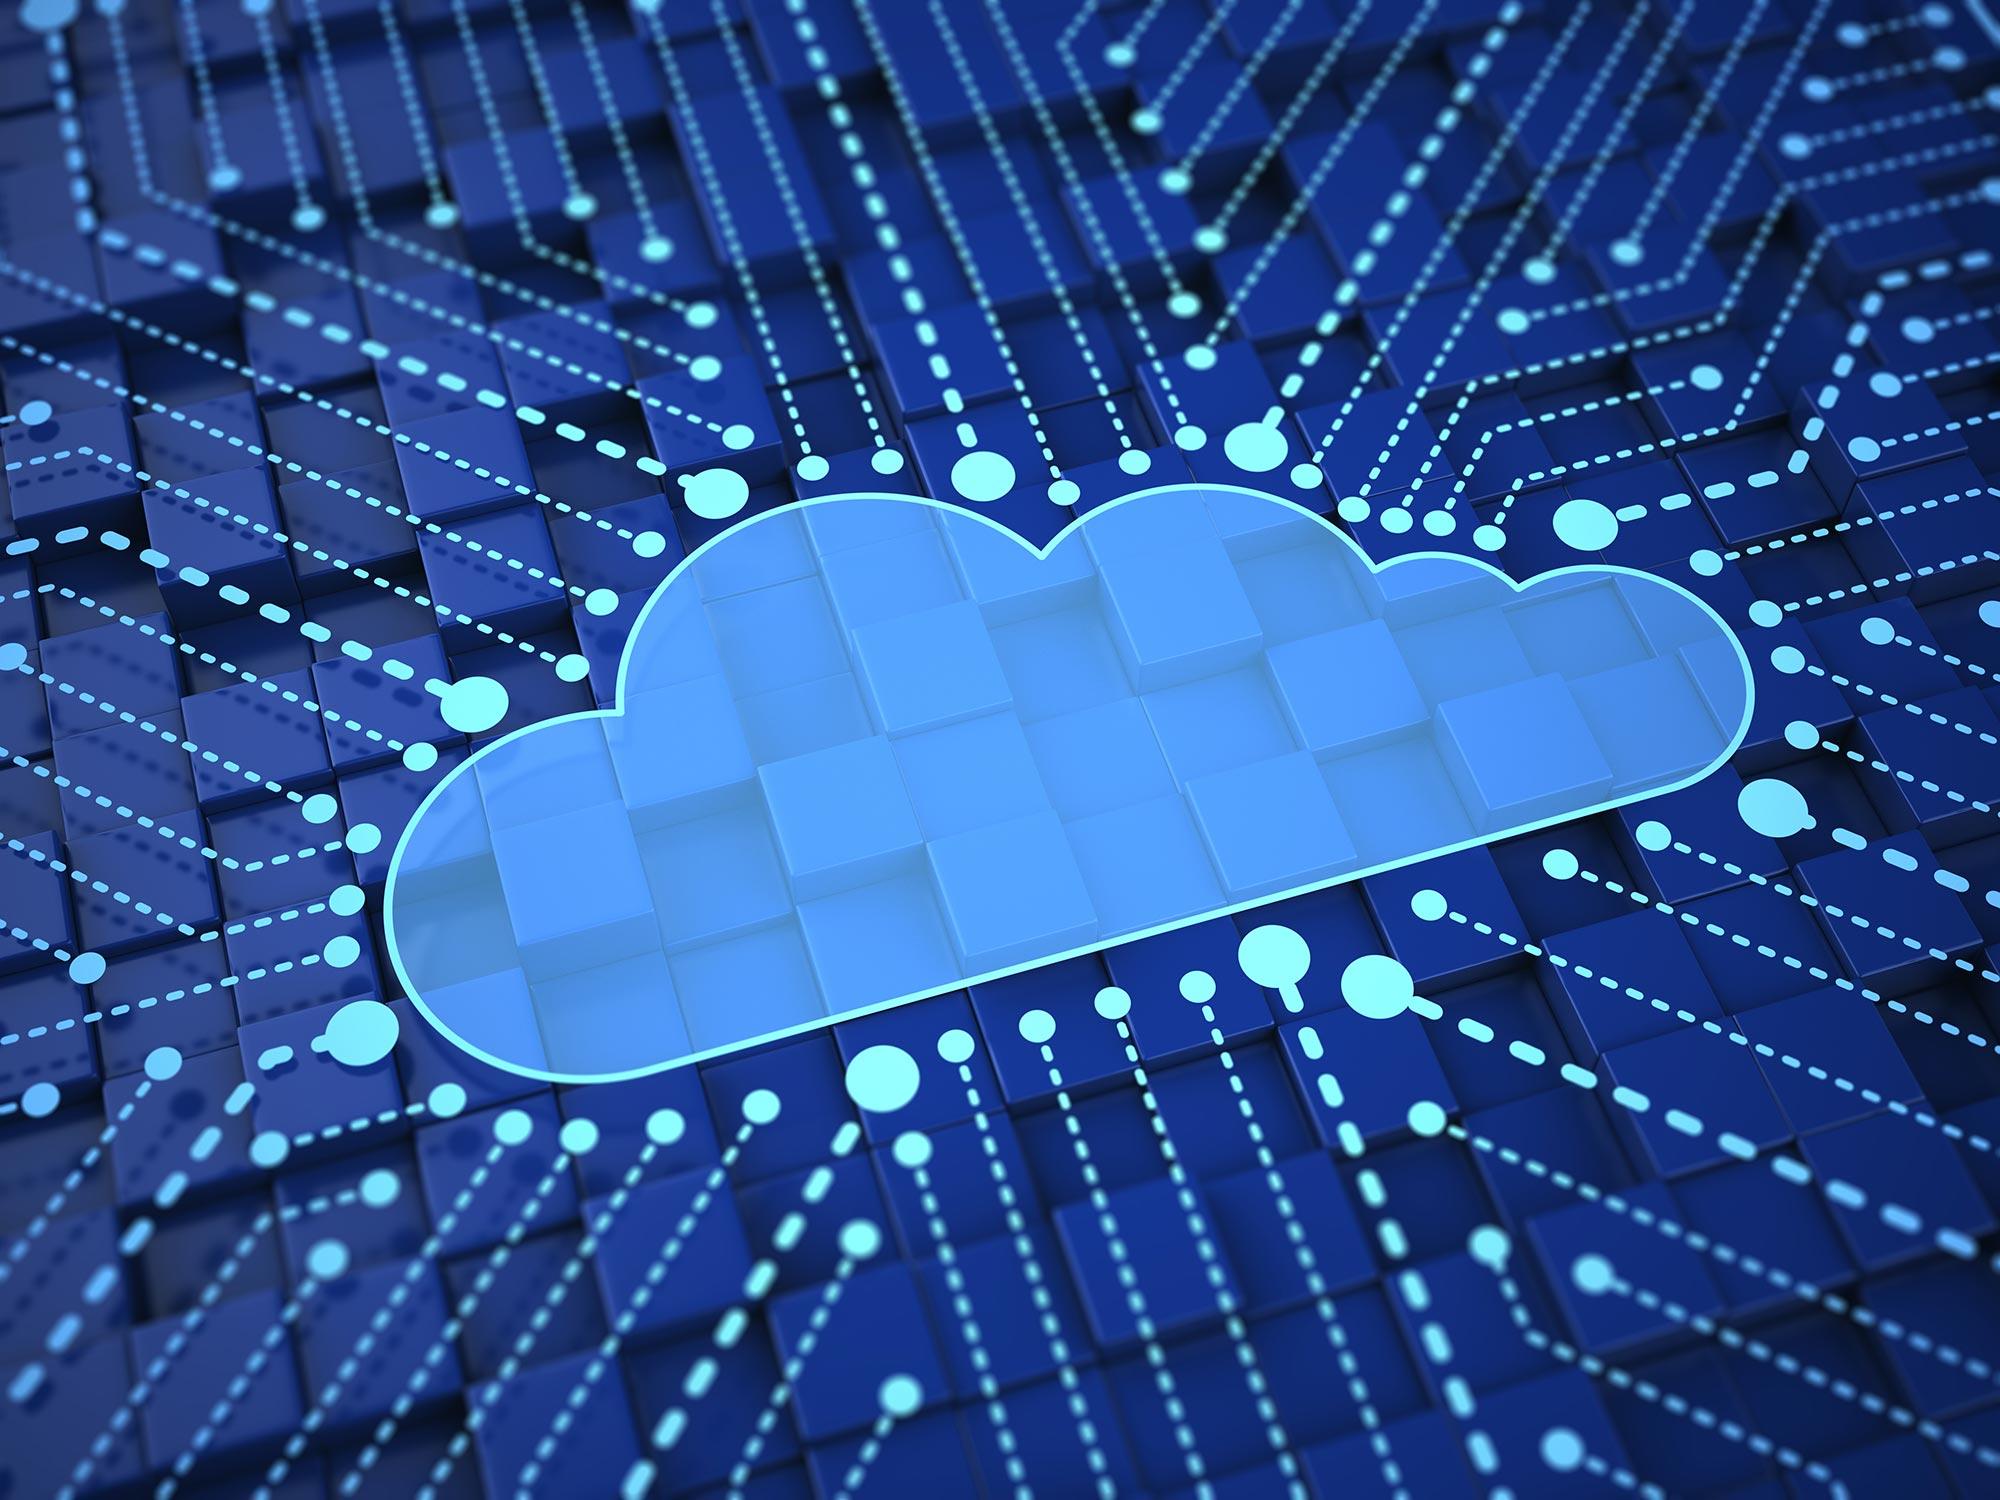 cloud-computing-circuit-chip-concept.jpg